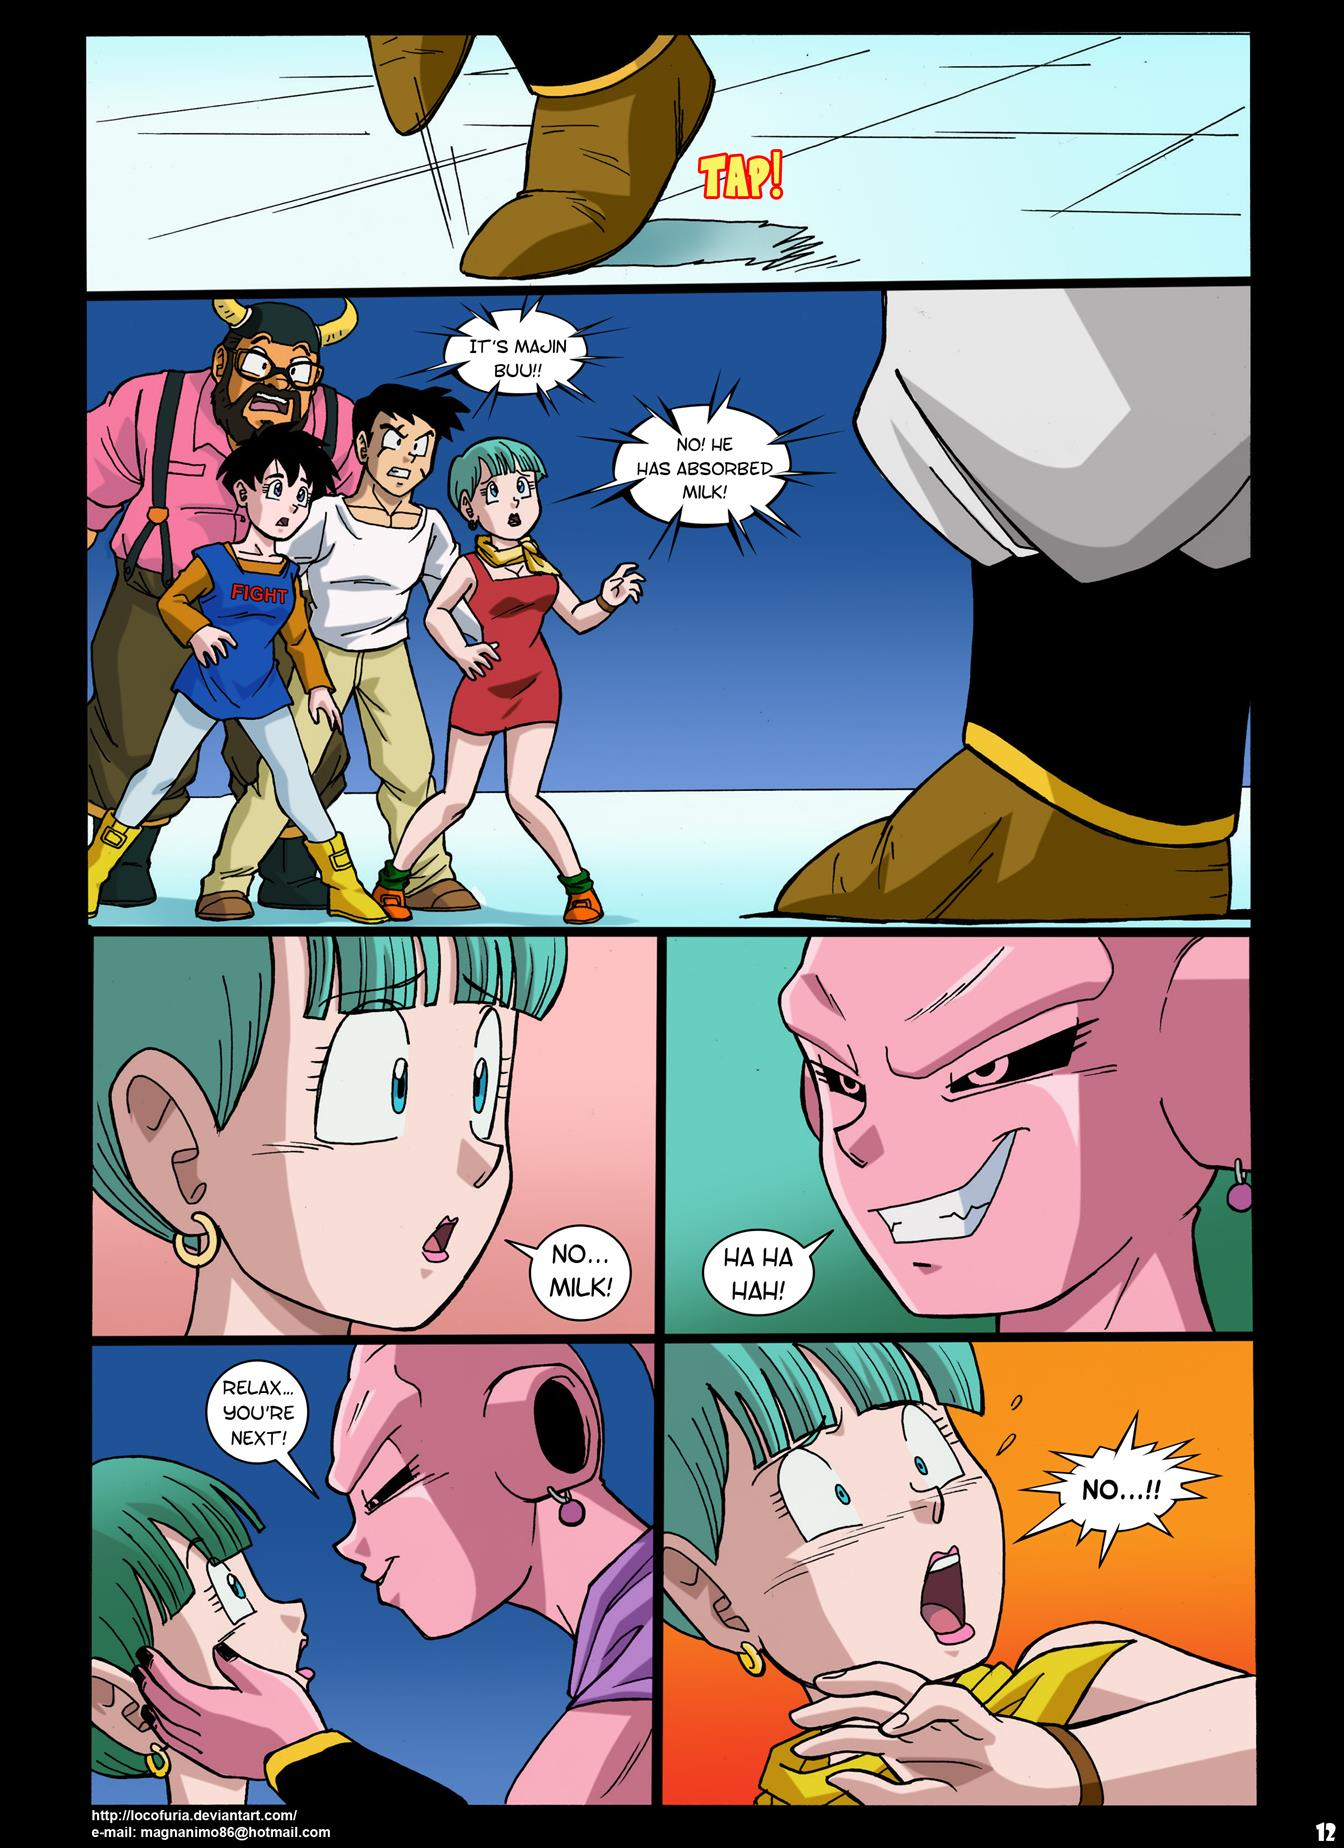 Buu's Bodies 1 (Dragon Ball Z) - Foto 14